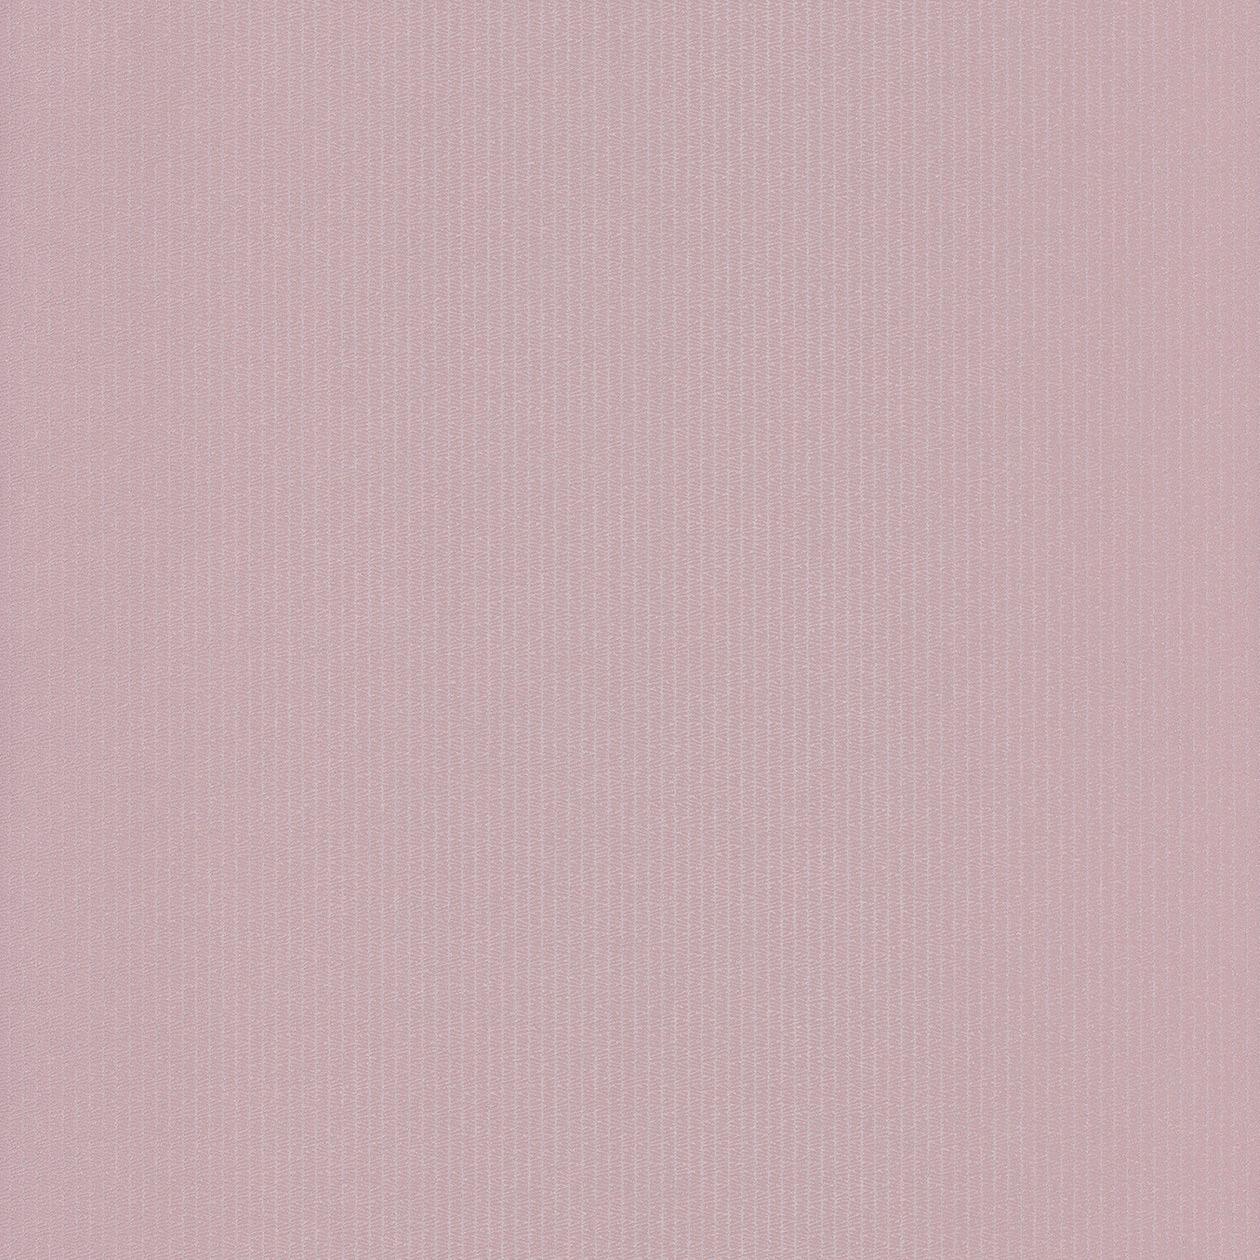 Французские обои Caselio,  коллекция Trio, артикулTIO68014000